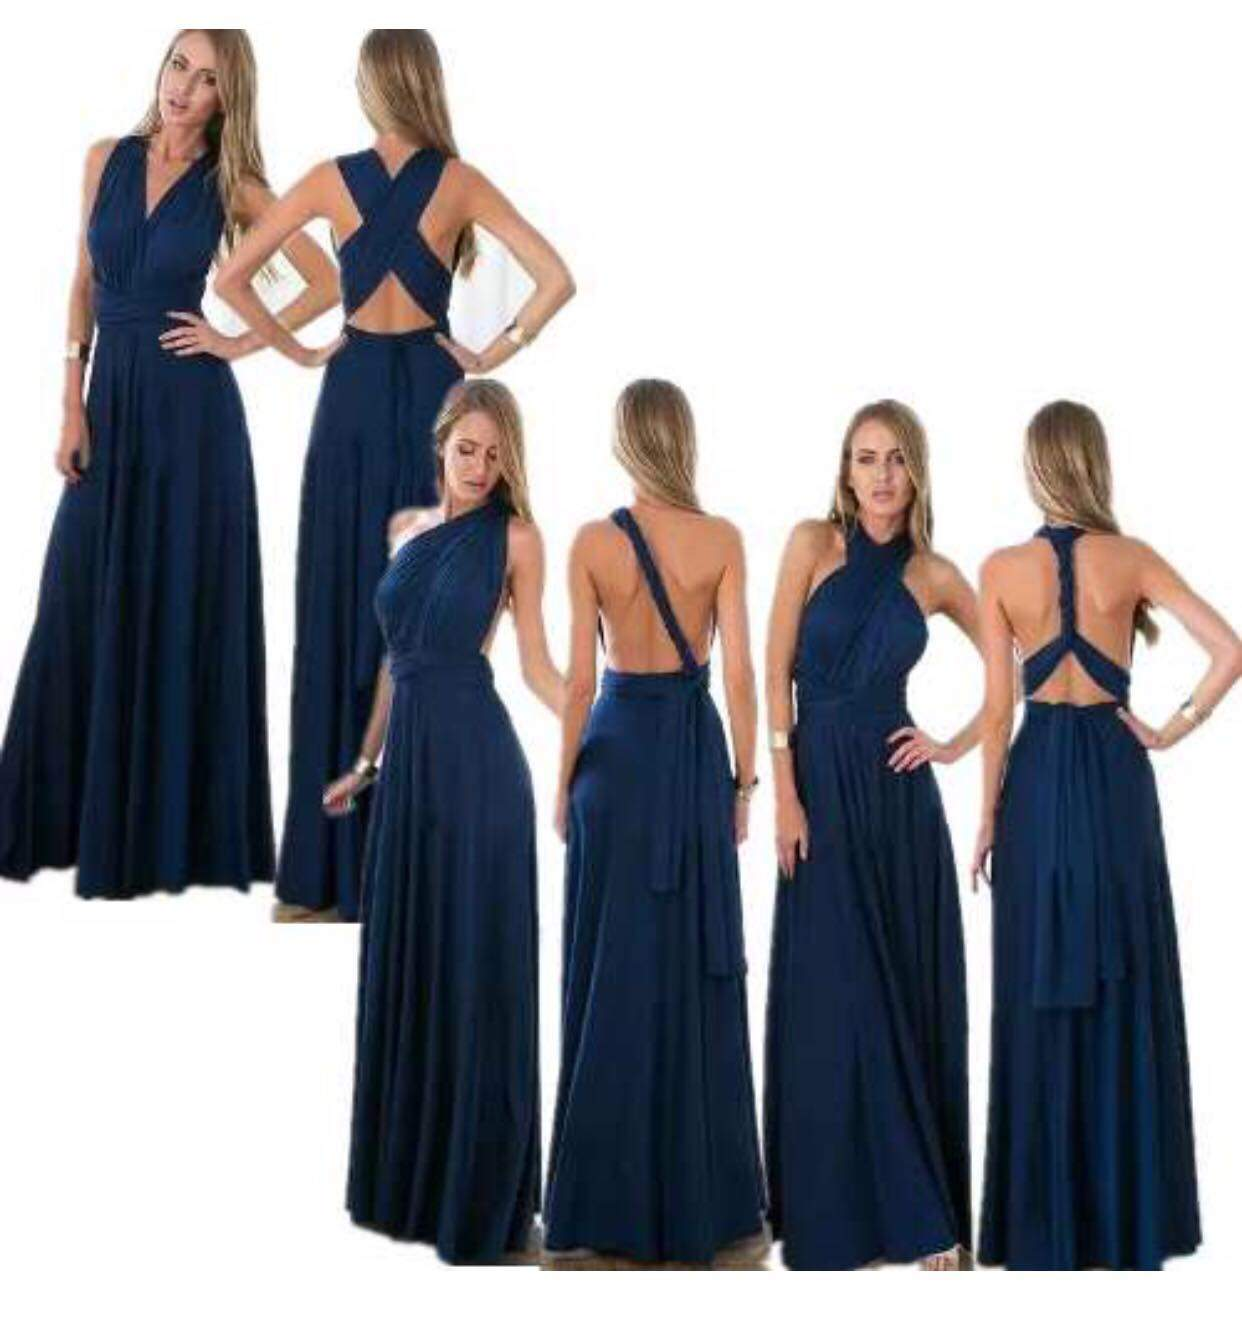 8cc6c0d05 Vestido longo multiuso em tecido crepe - Mon Cherri Moda Feminina